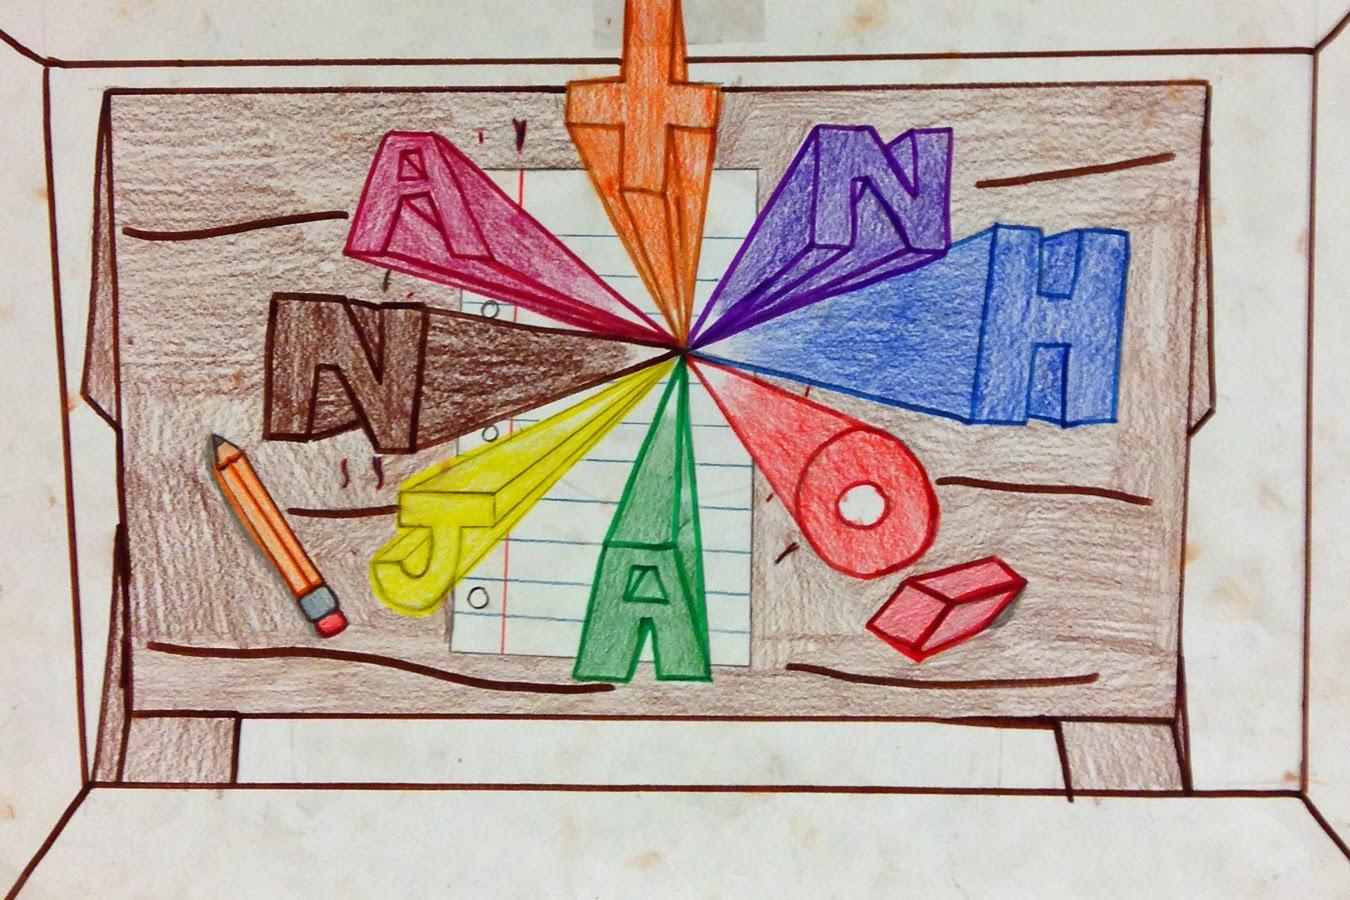 Name Drawings: Art At Leestown: One Point Perspective Name Drawings